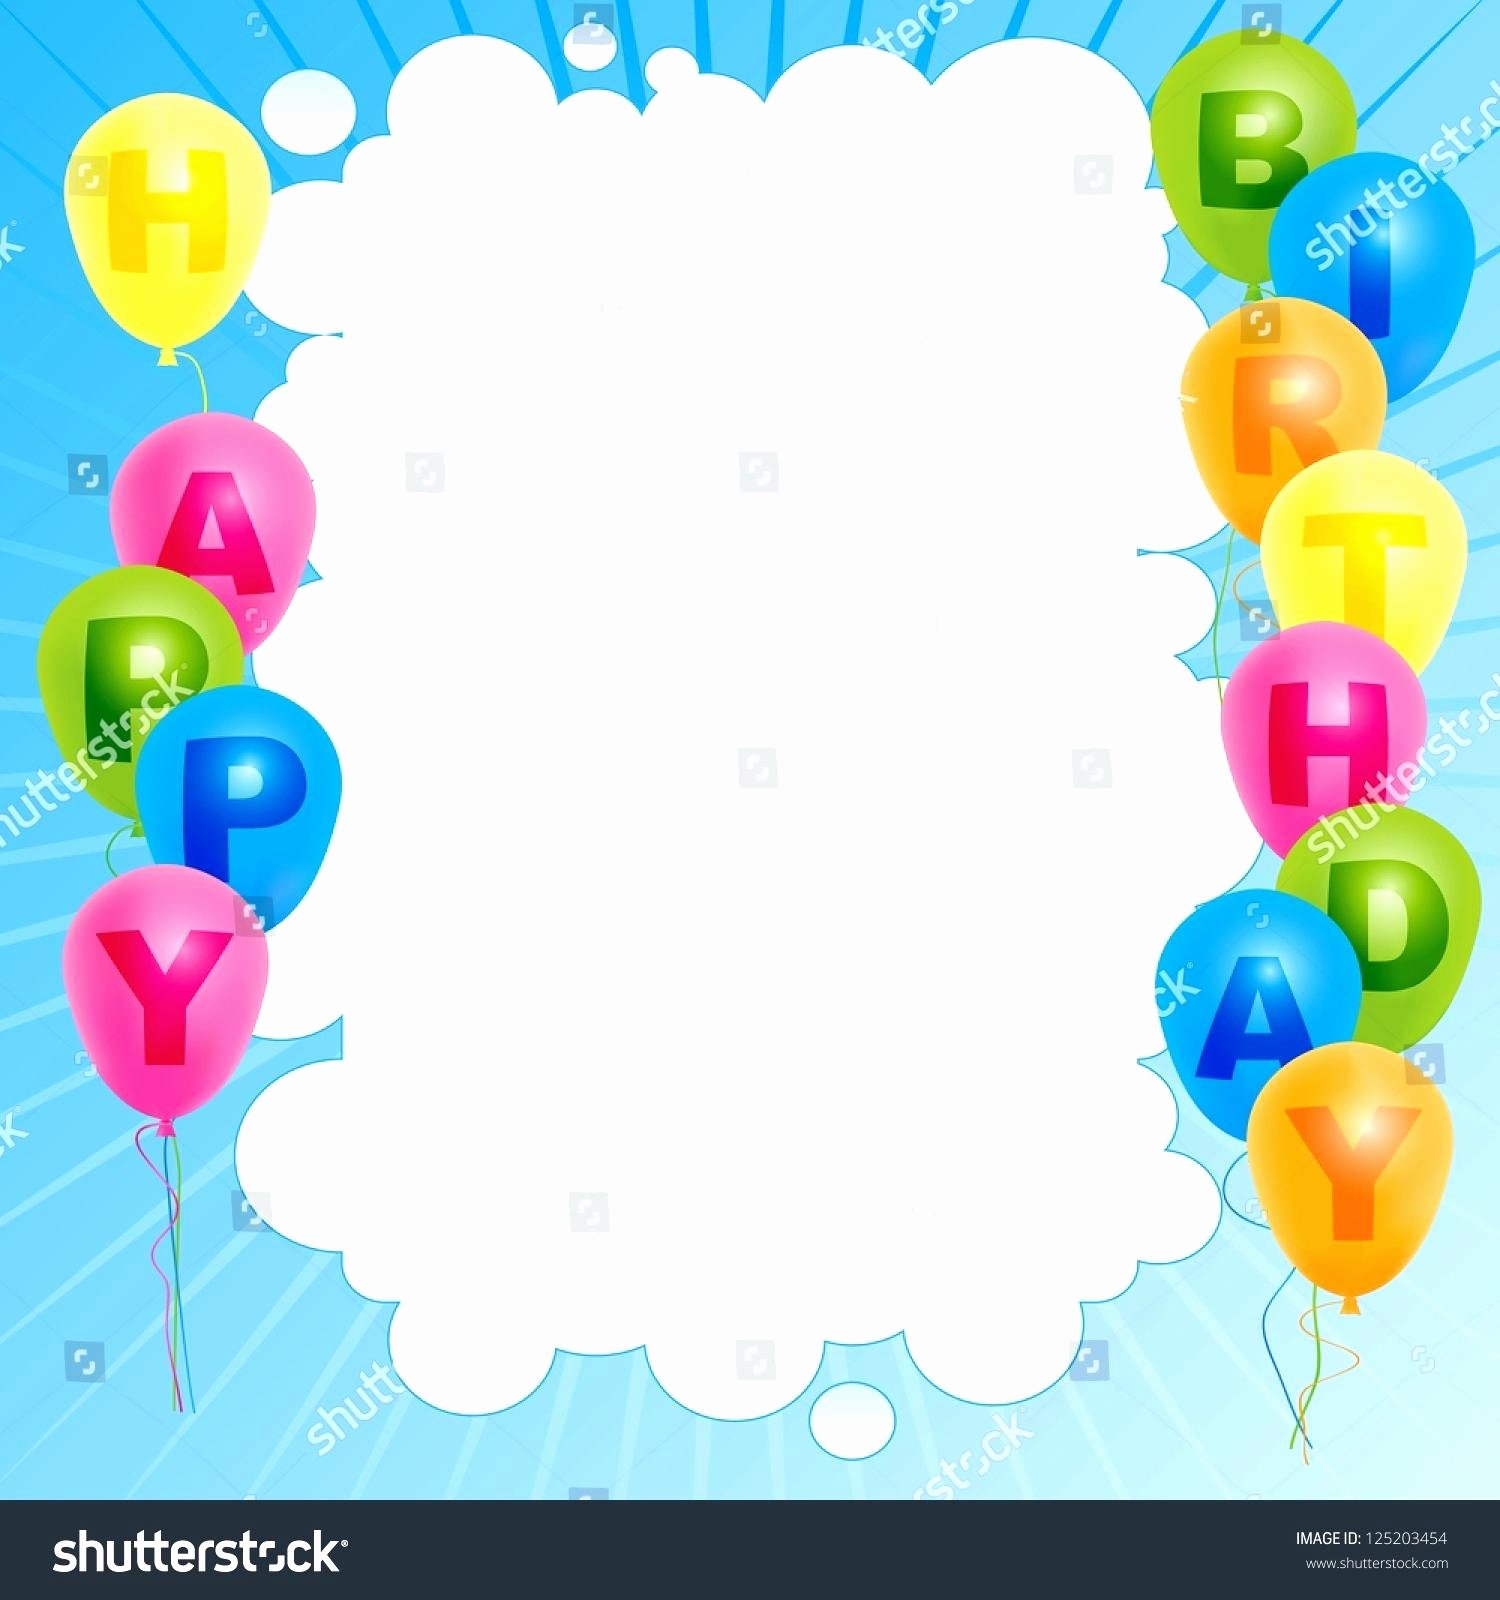 Happy Birthday Template Word Inspirational Template Happy Birthday Card Template Word